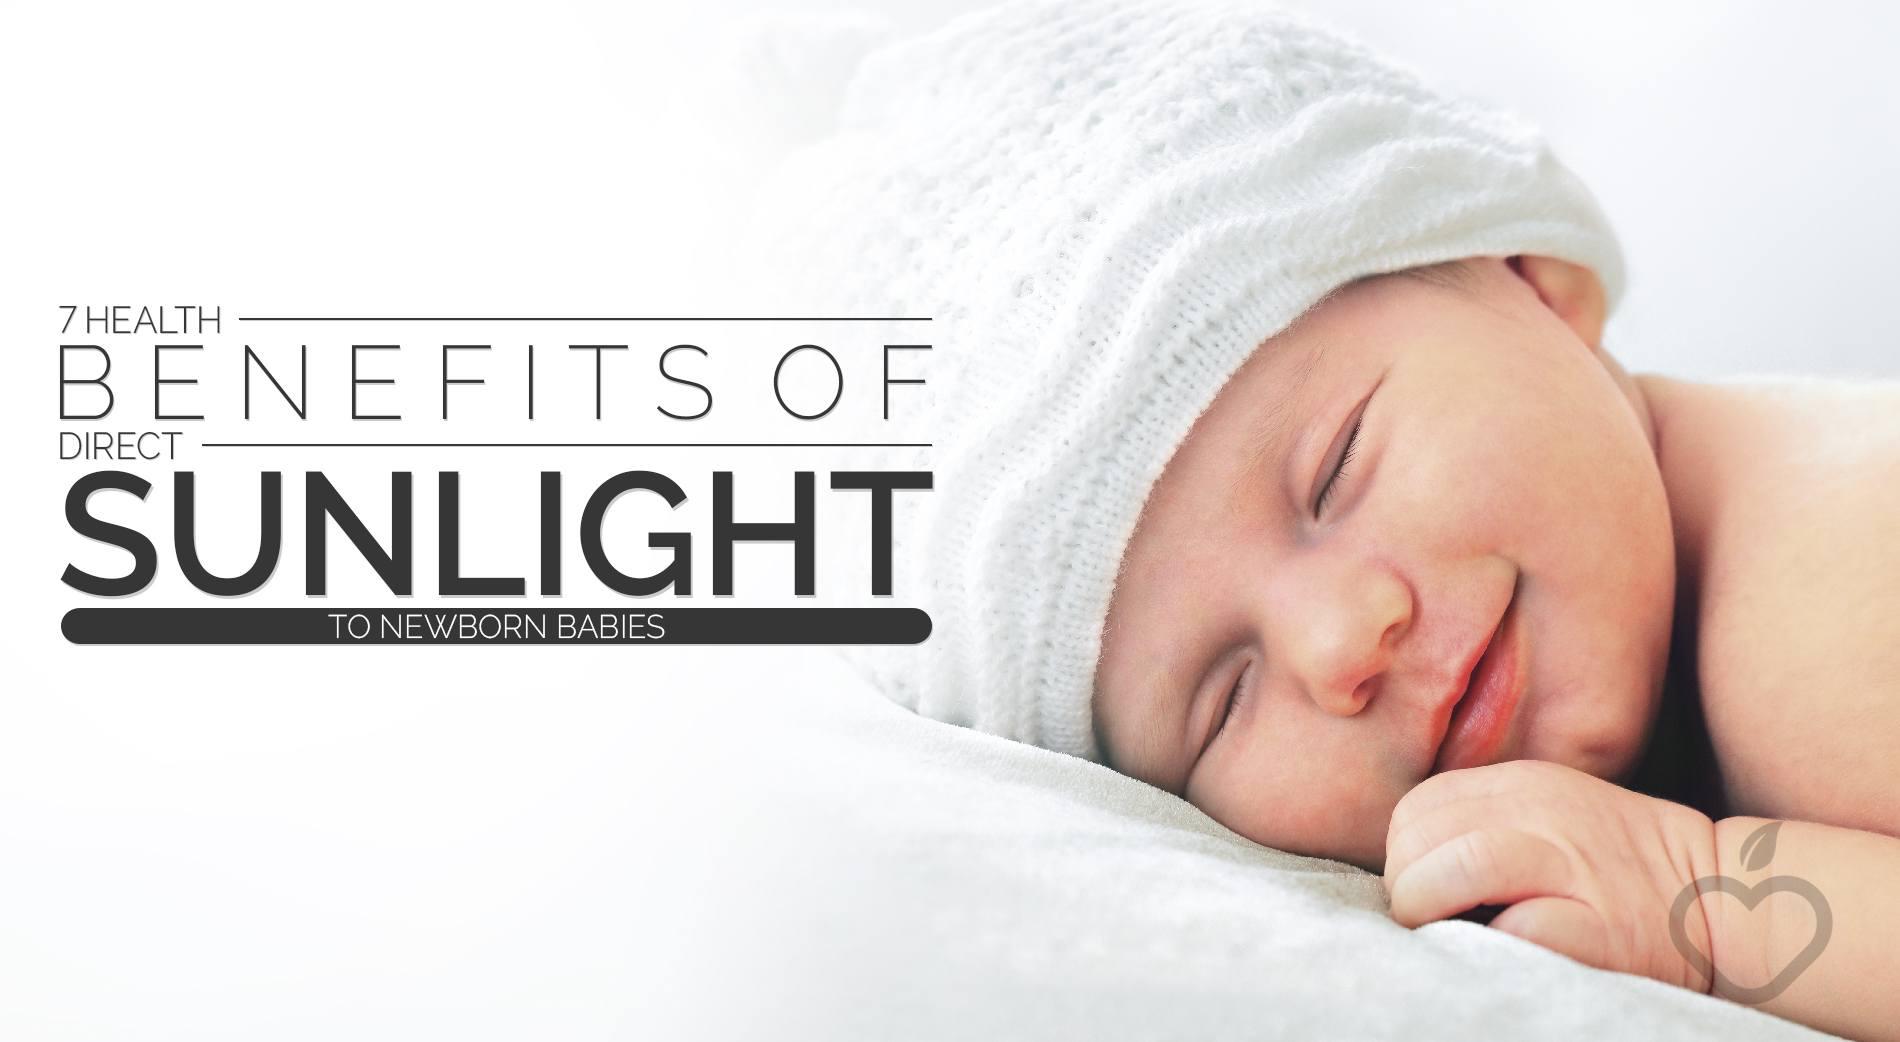 7 health benefits of direct sunlight to newborn babies